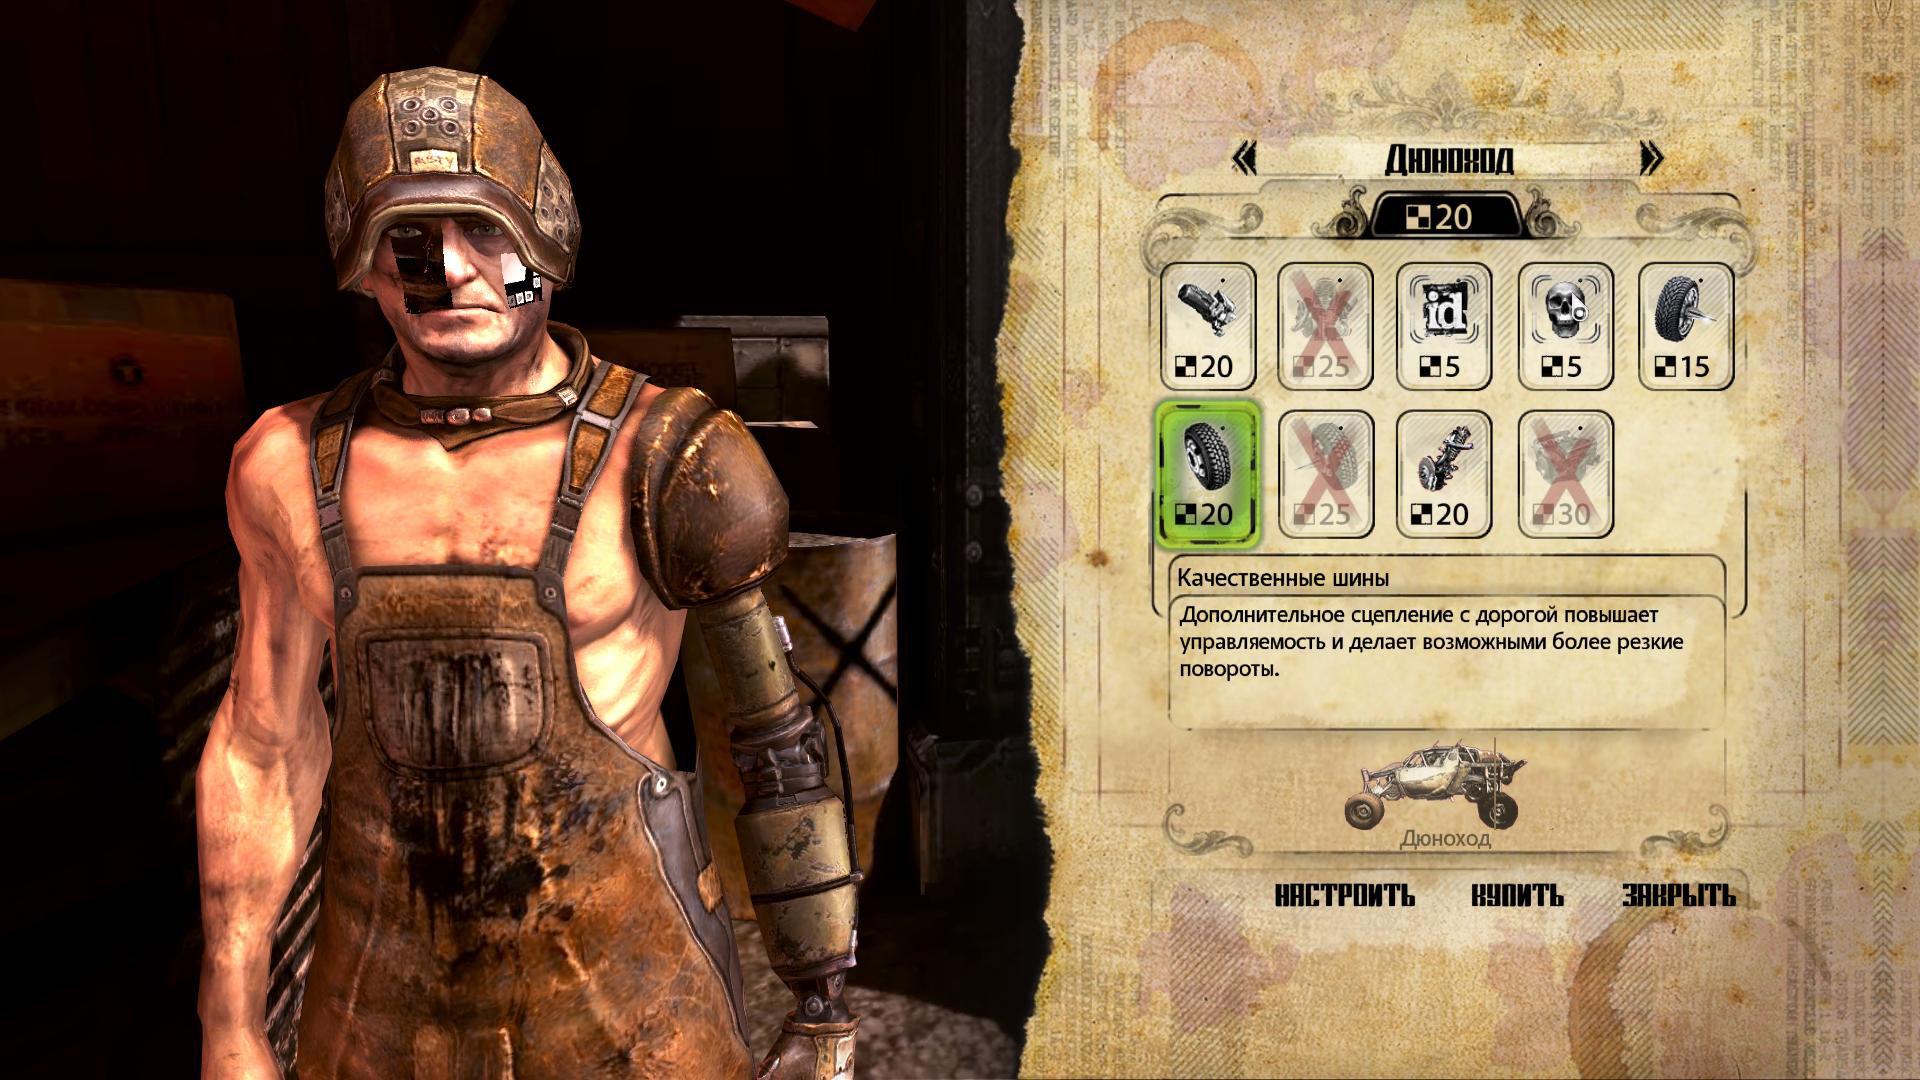 Баги с текстурами на лице. Здесь их еще ...: gamer-info.com/game/rage/review